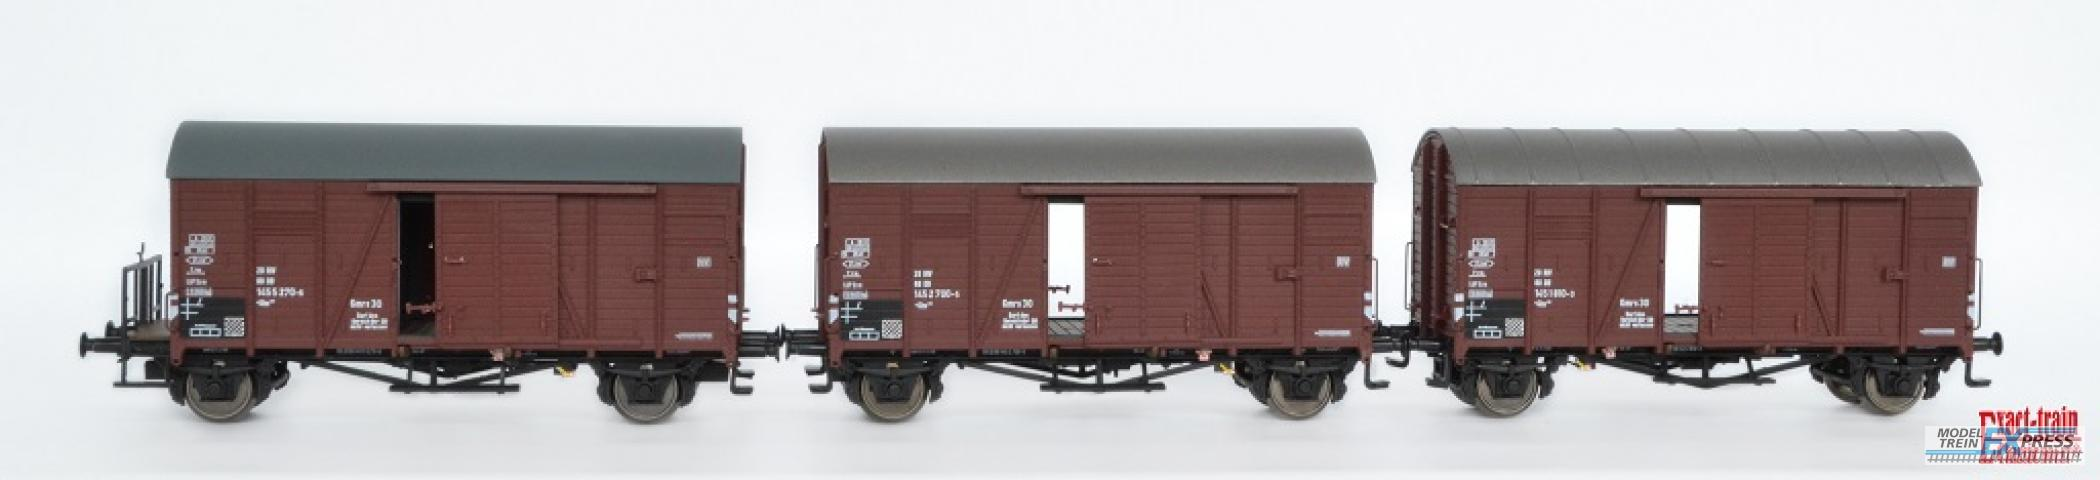 Exact-train 20111